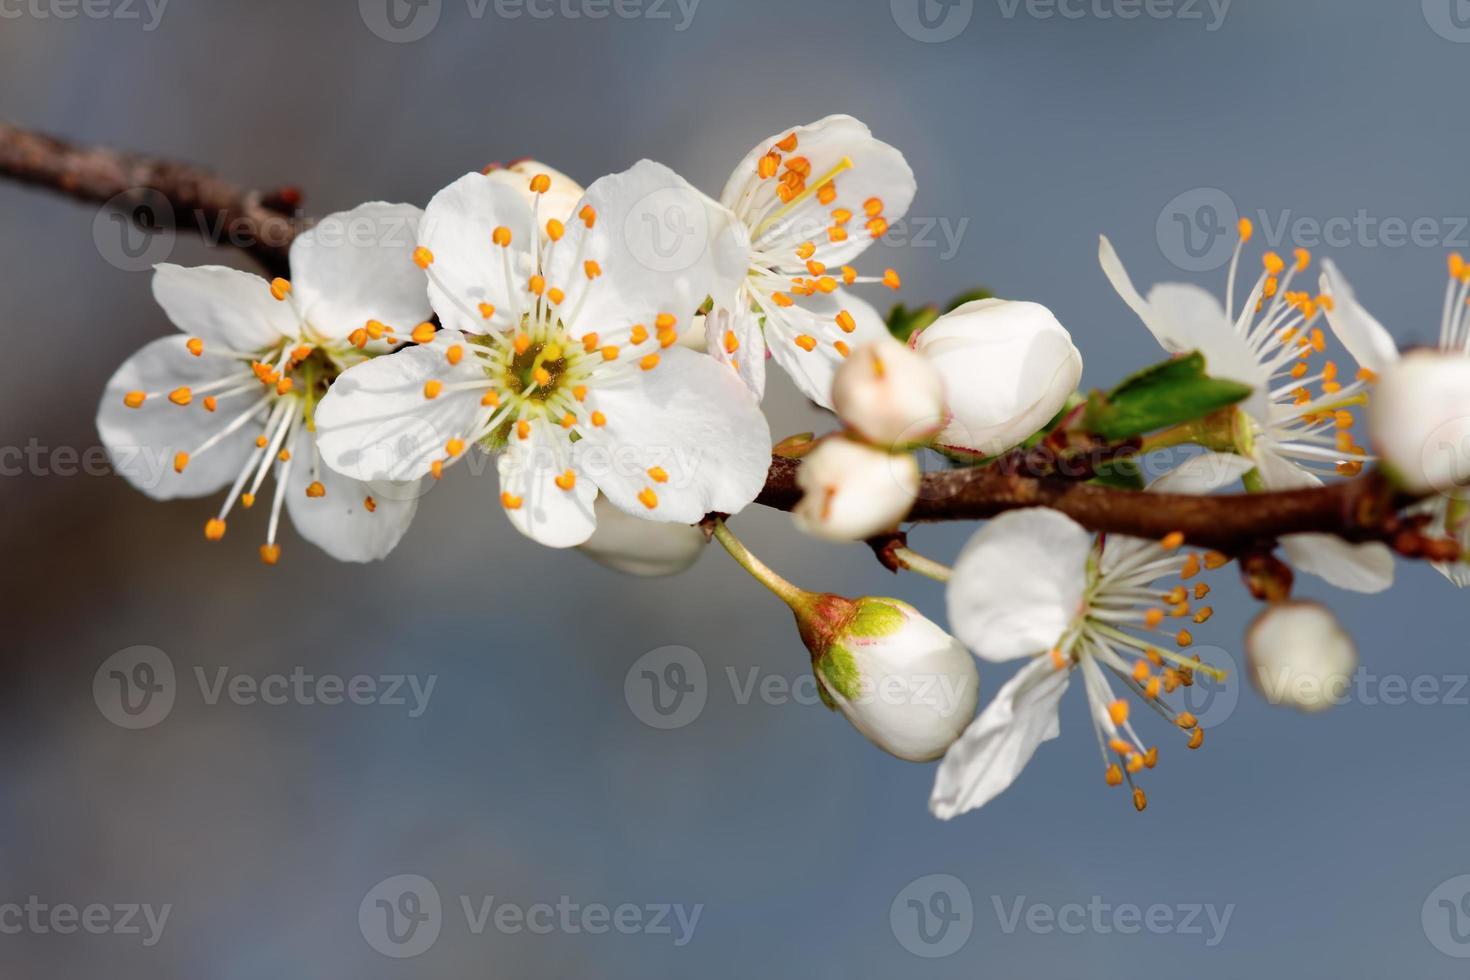 the fruits blossom photo